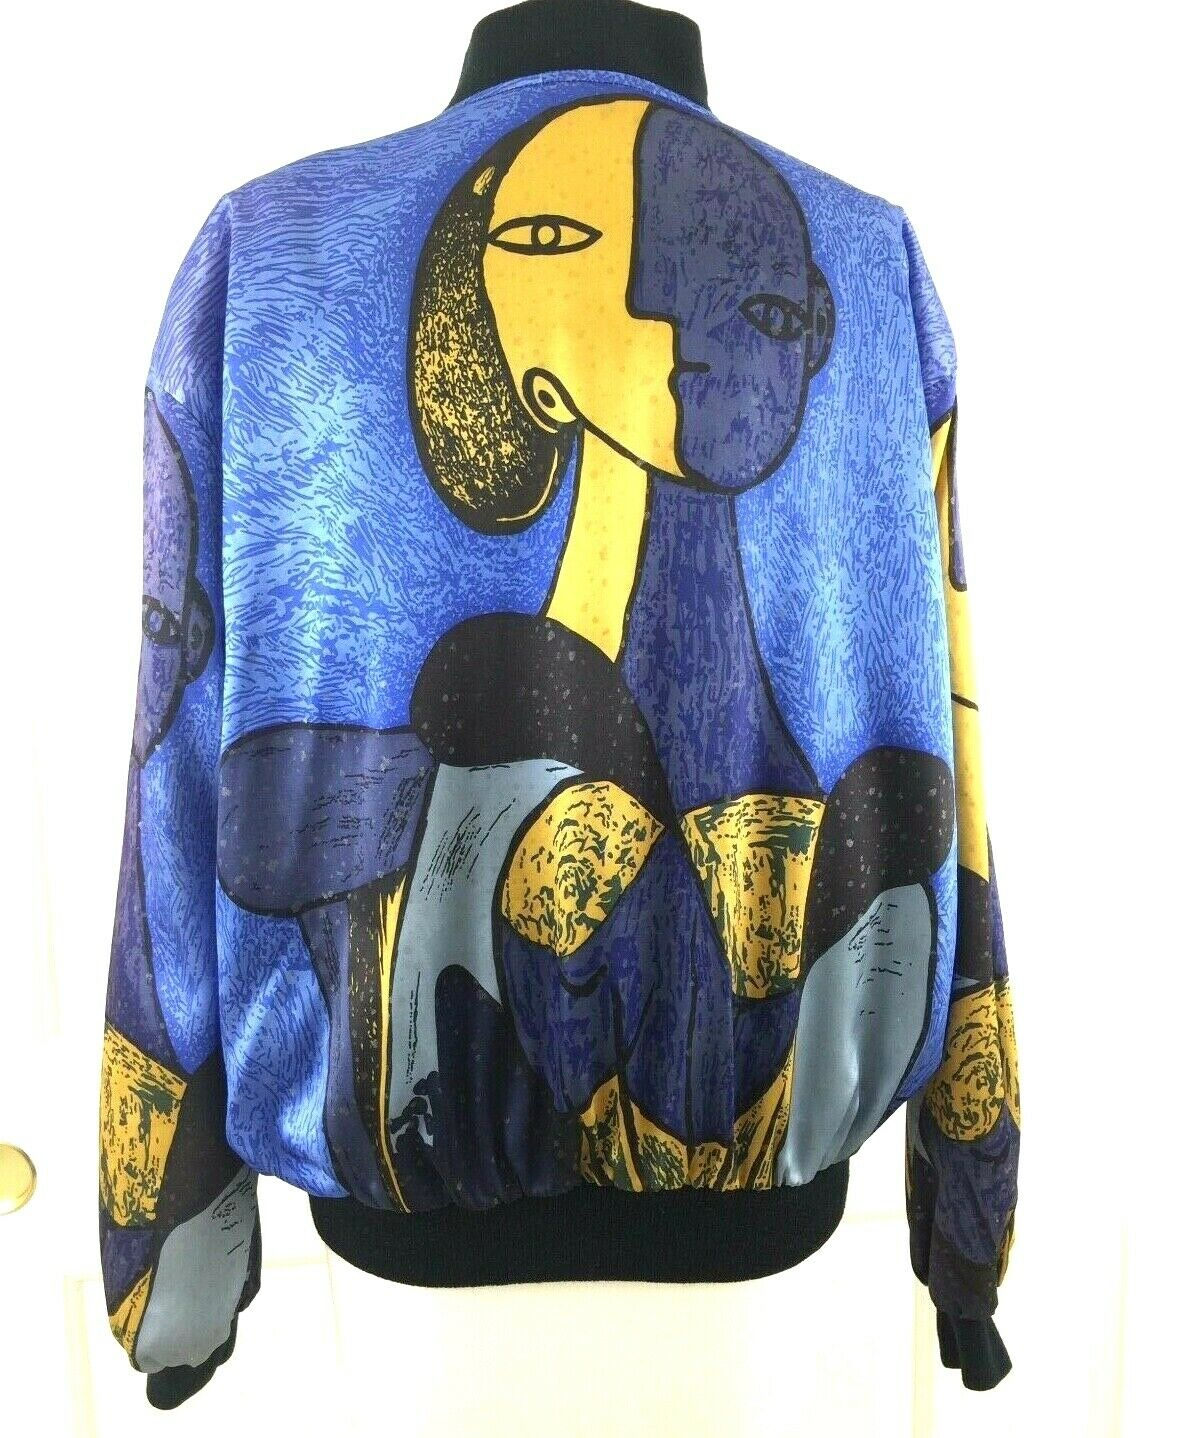 Vtg 80s Picasso Bomber Jacket Satin Windbreaker Art Women M L Fresh Prince Blue